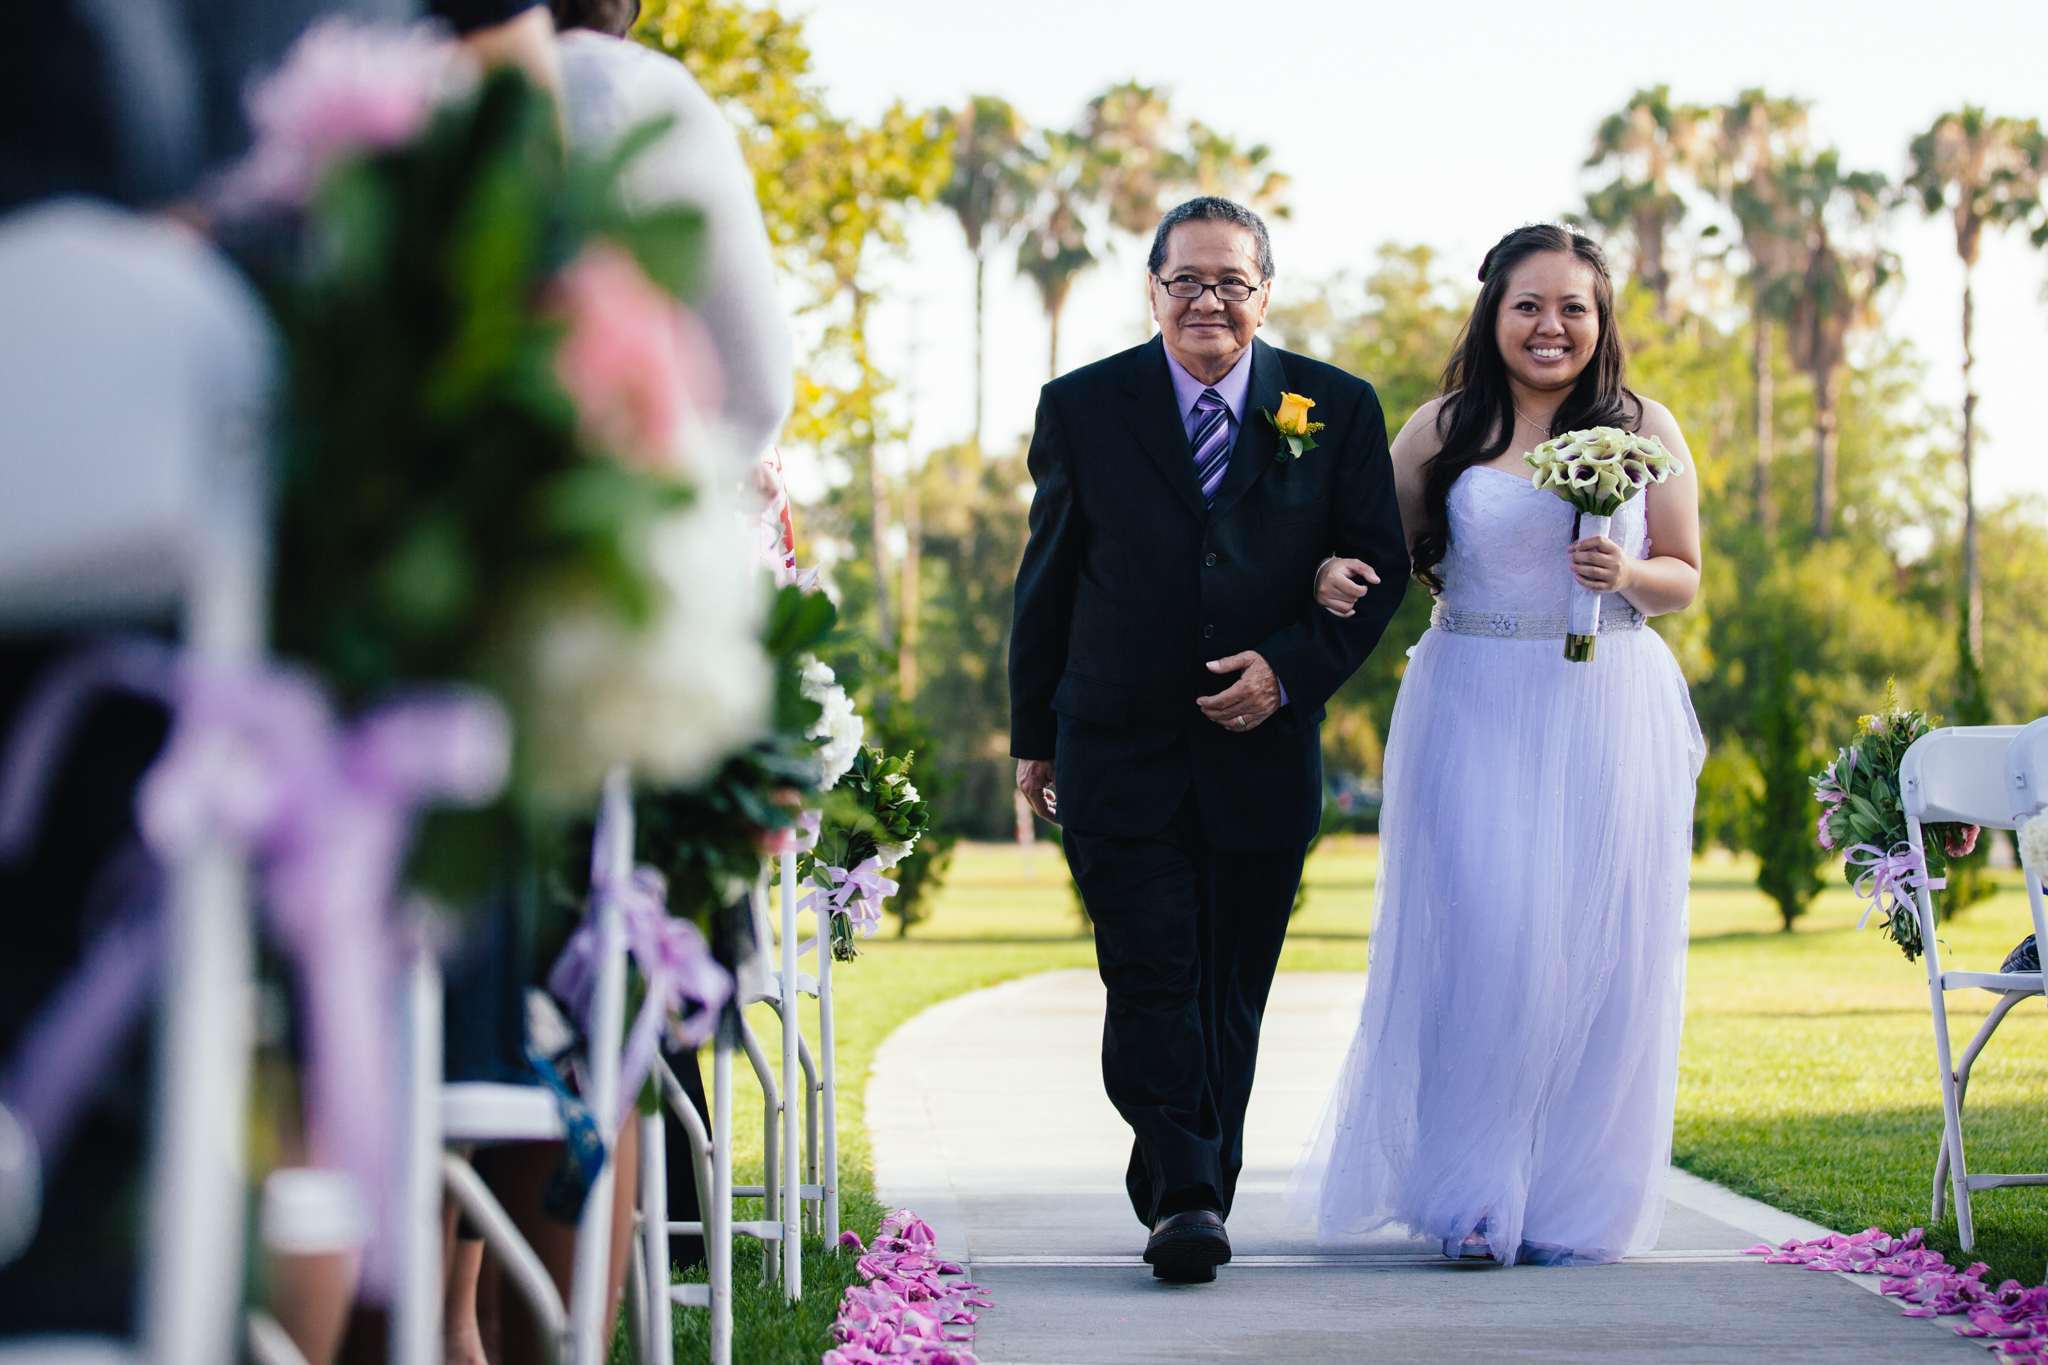 RLP-Ceremony-Michelle+Daniel-44.jpg